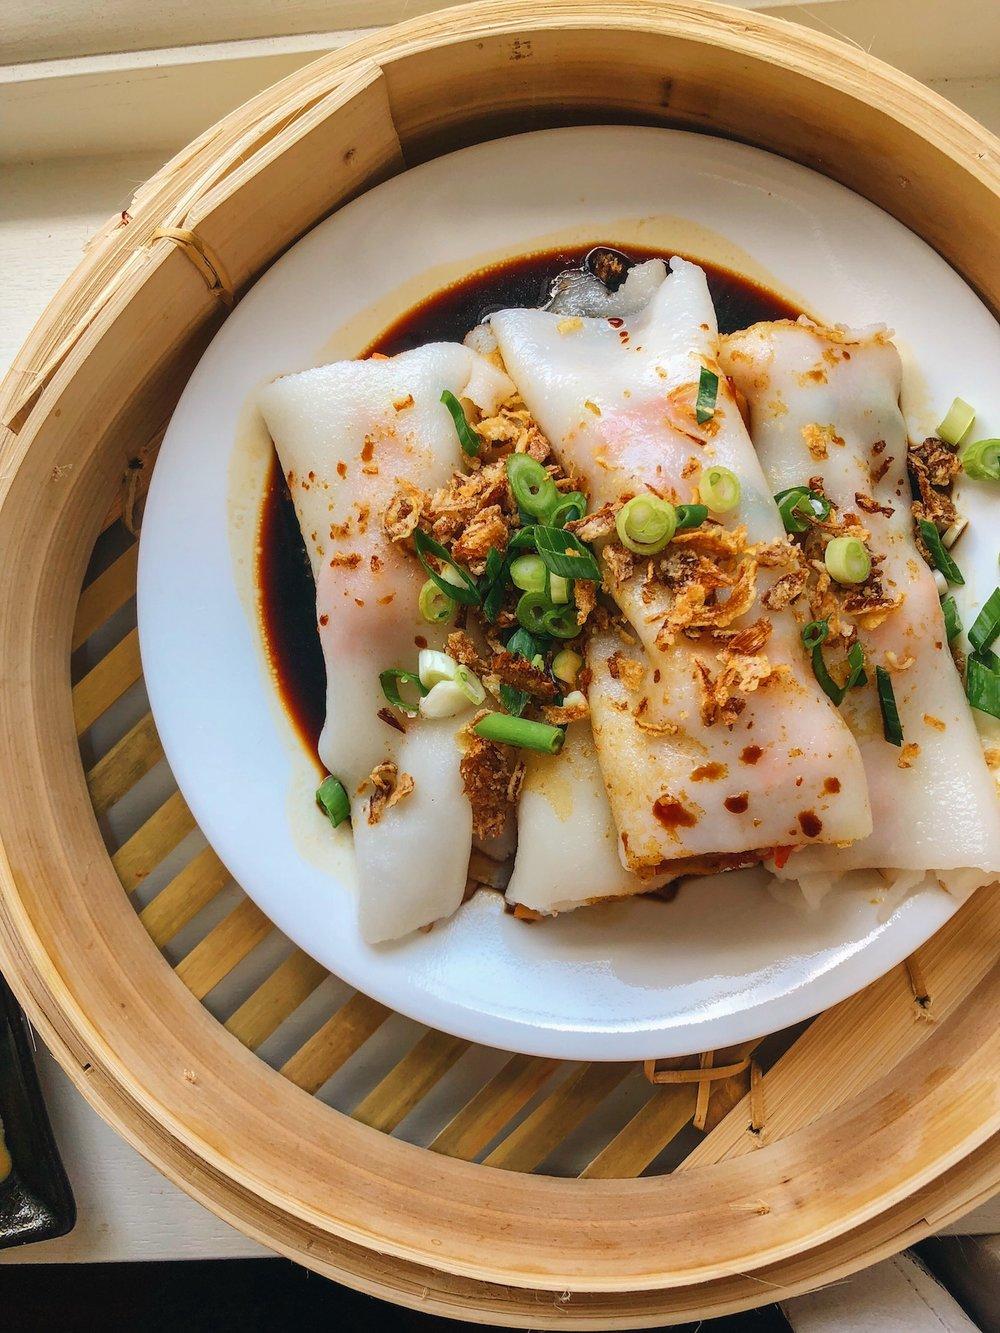 BBQ 'Pork' Cheung Fun made with  Sayur Vegan BBQ Pork